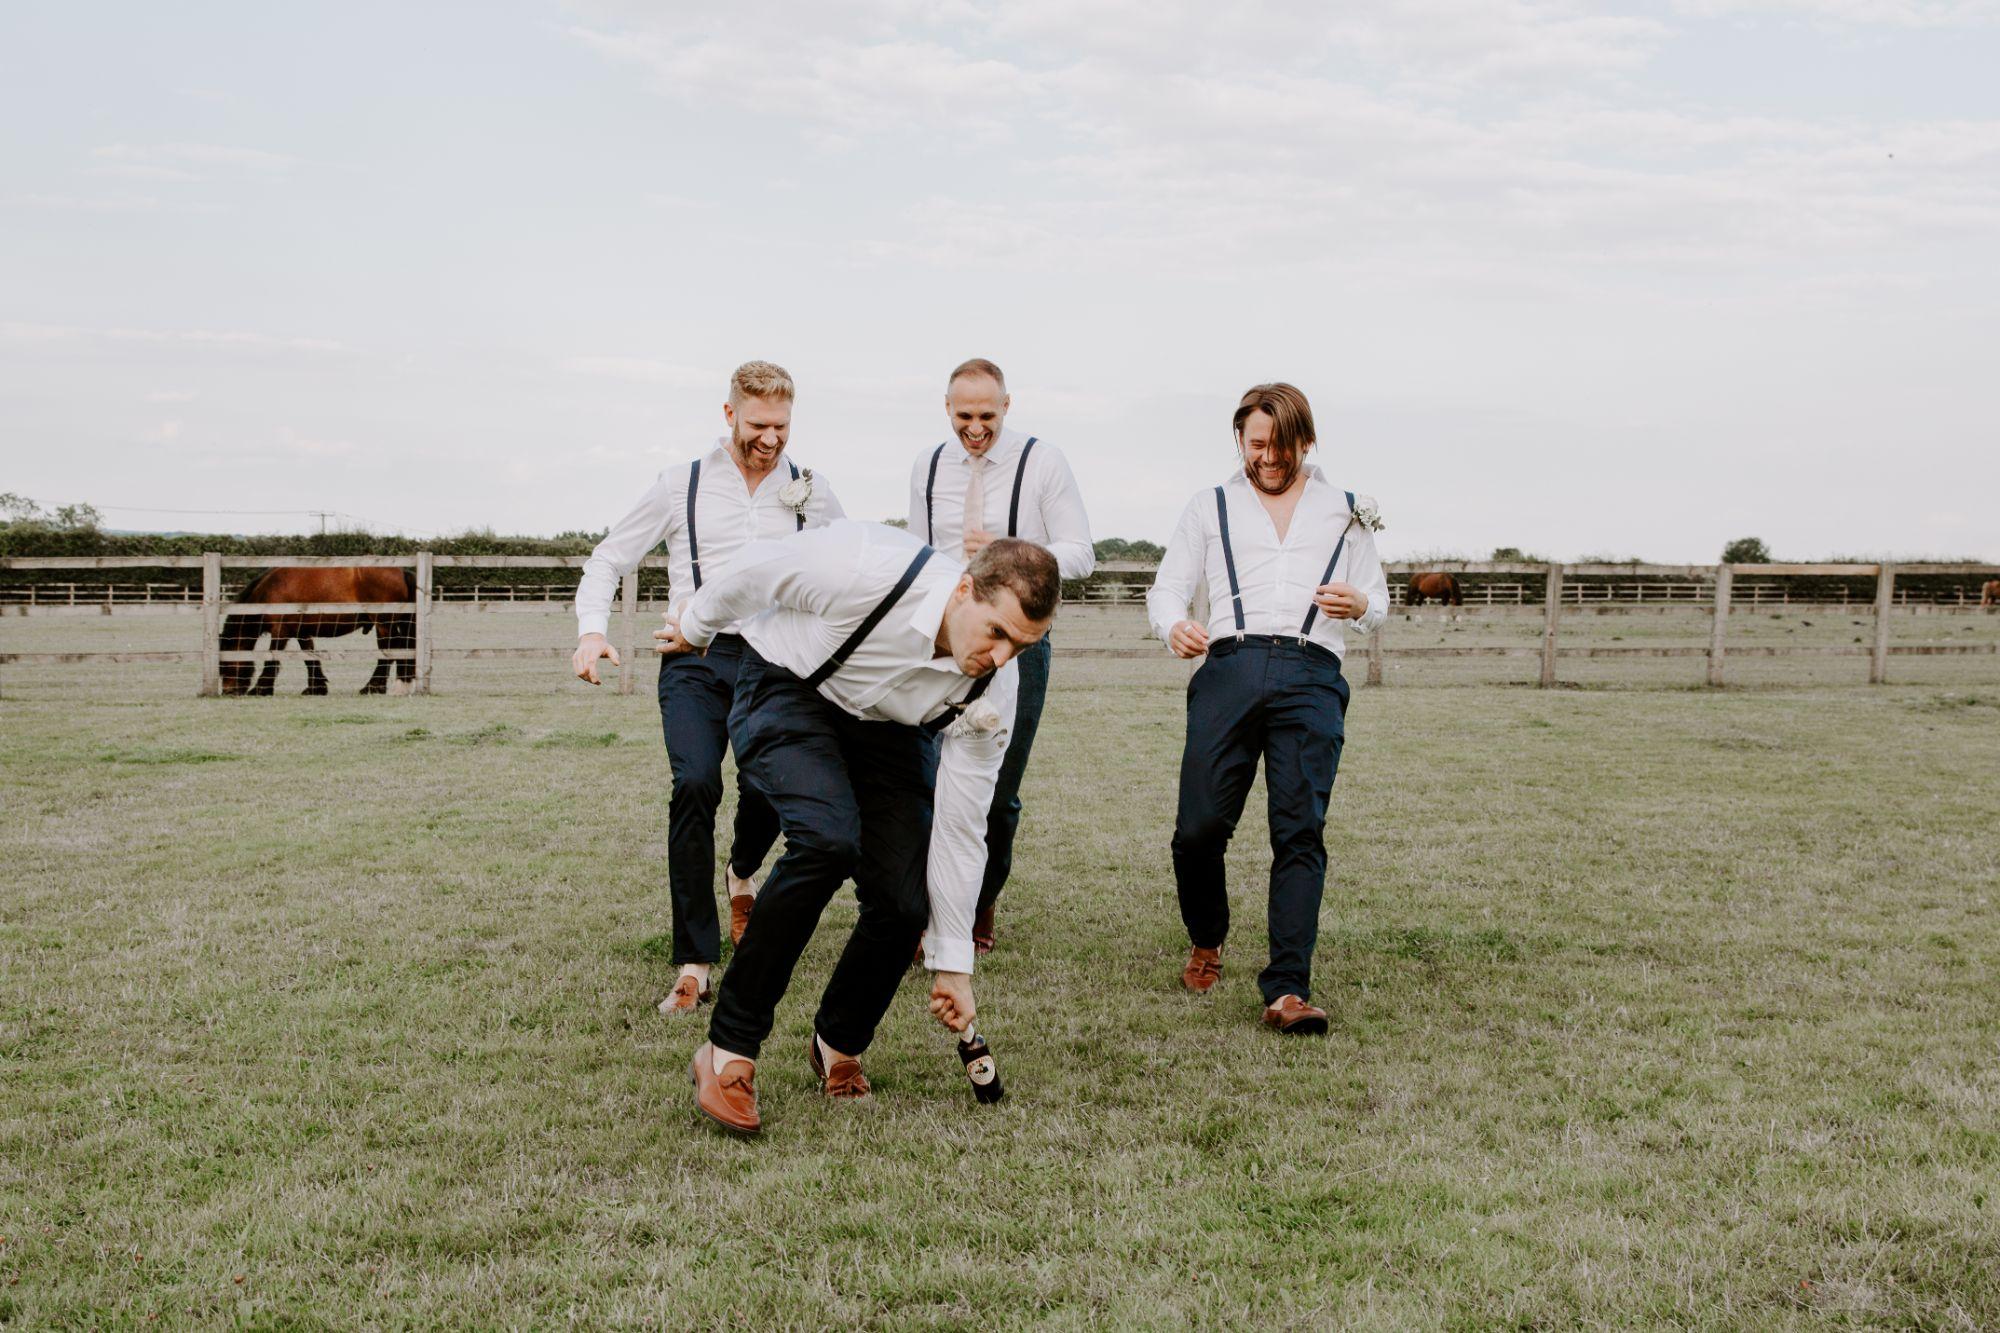 Wedding_Photography_Becky_Tranter-10.jpg